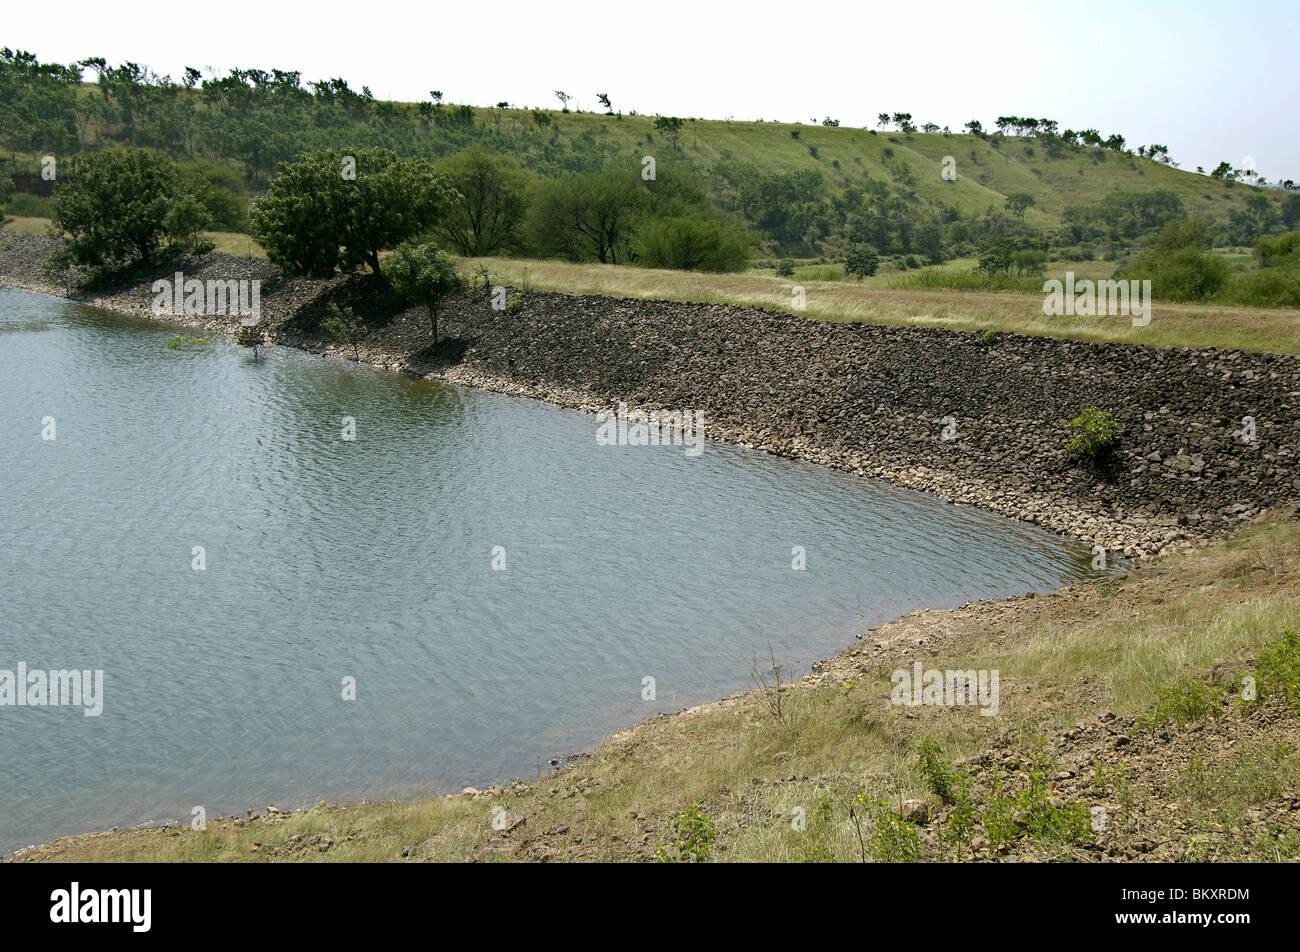 hight resolution of percolation tank at ralegan siddhi near pune maharashtra india stock image